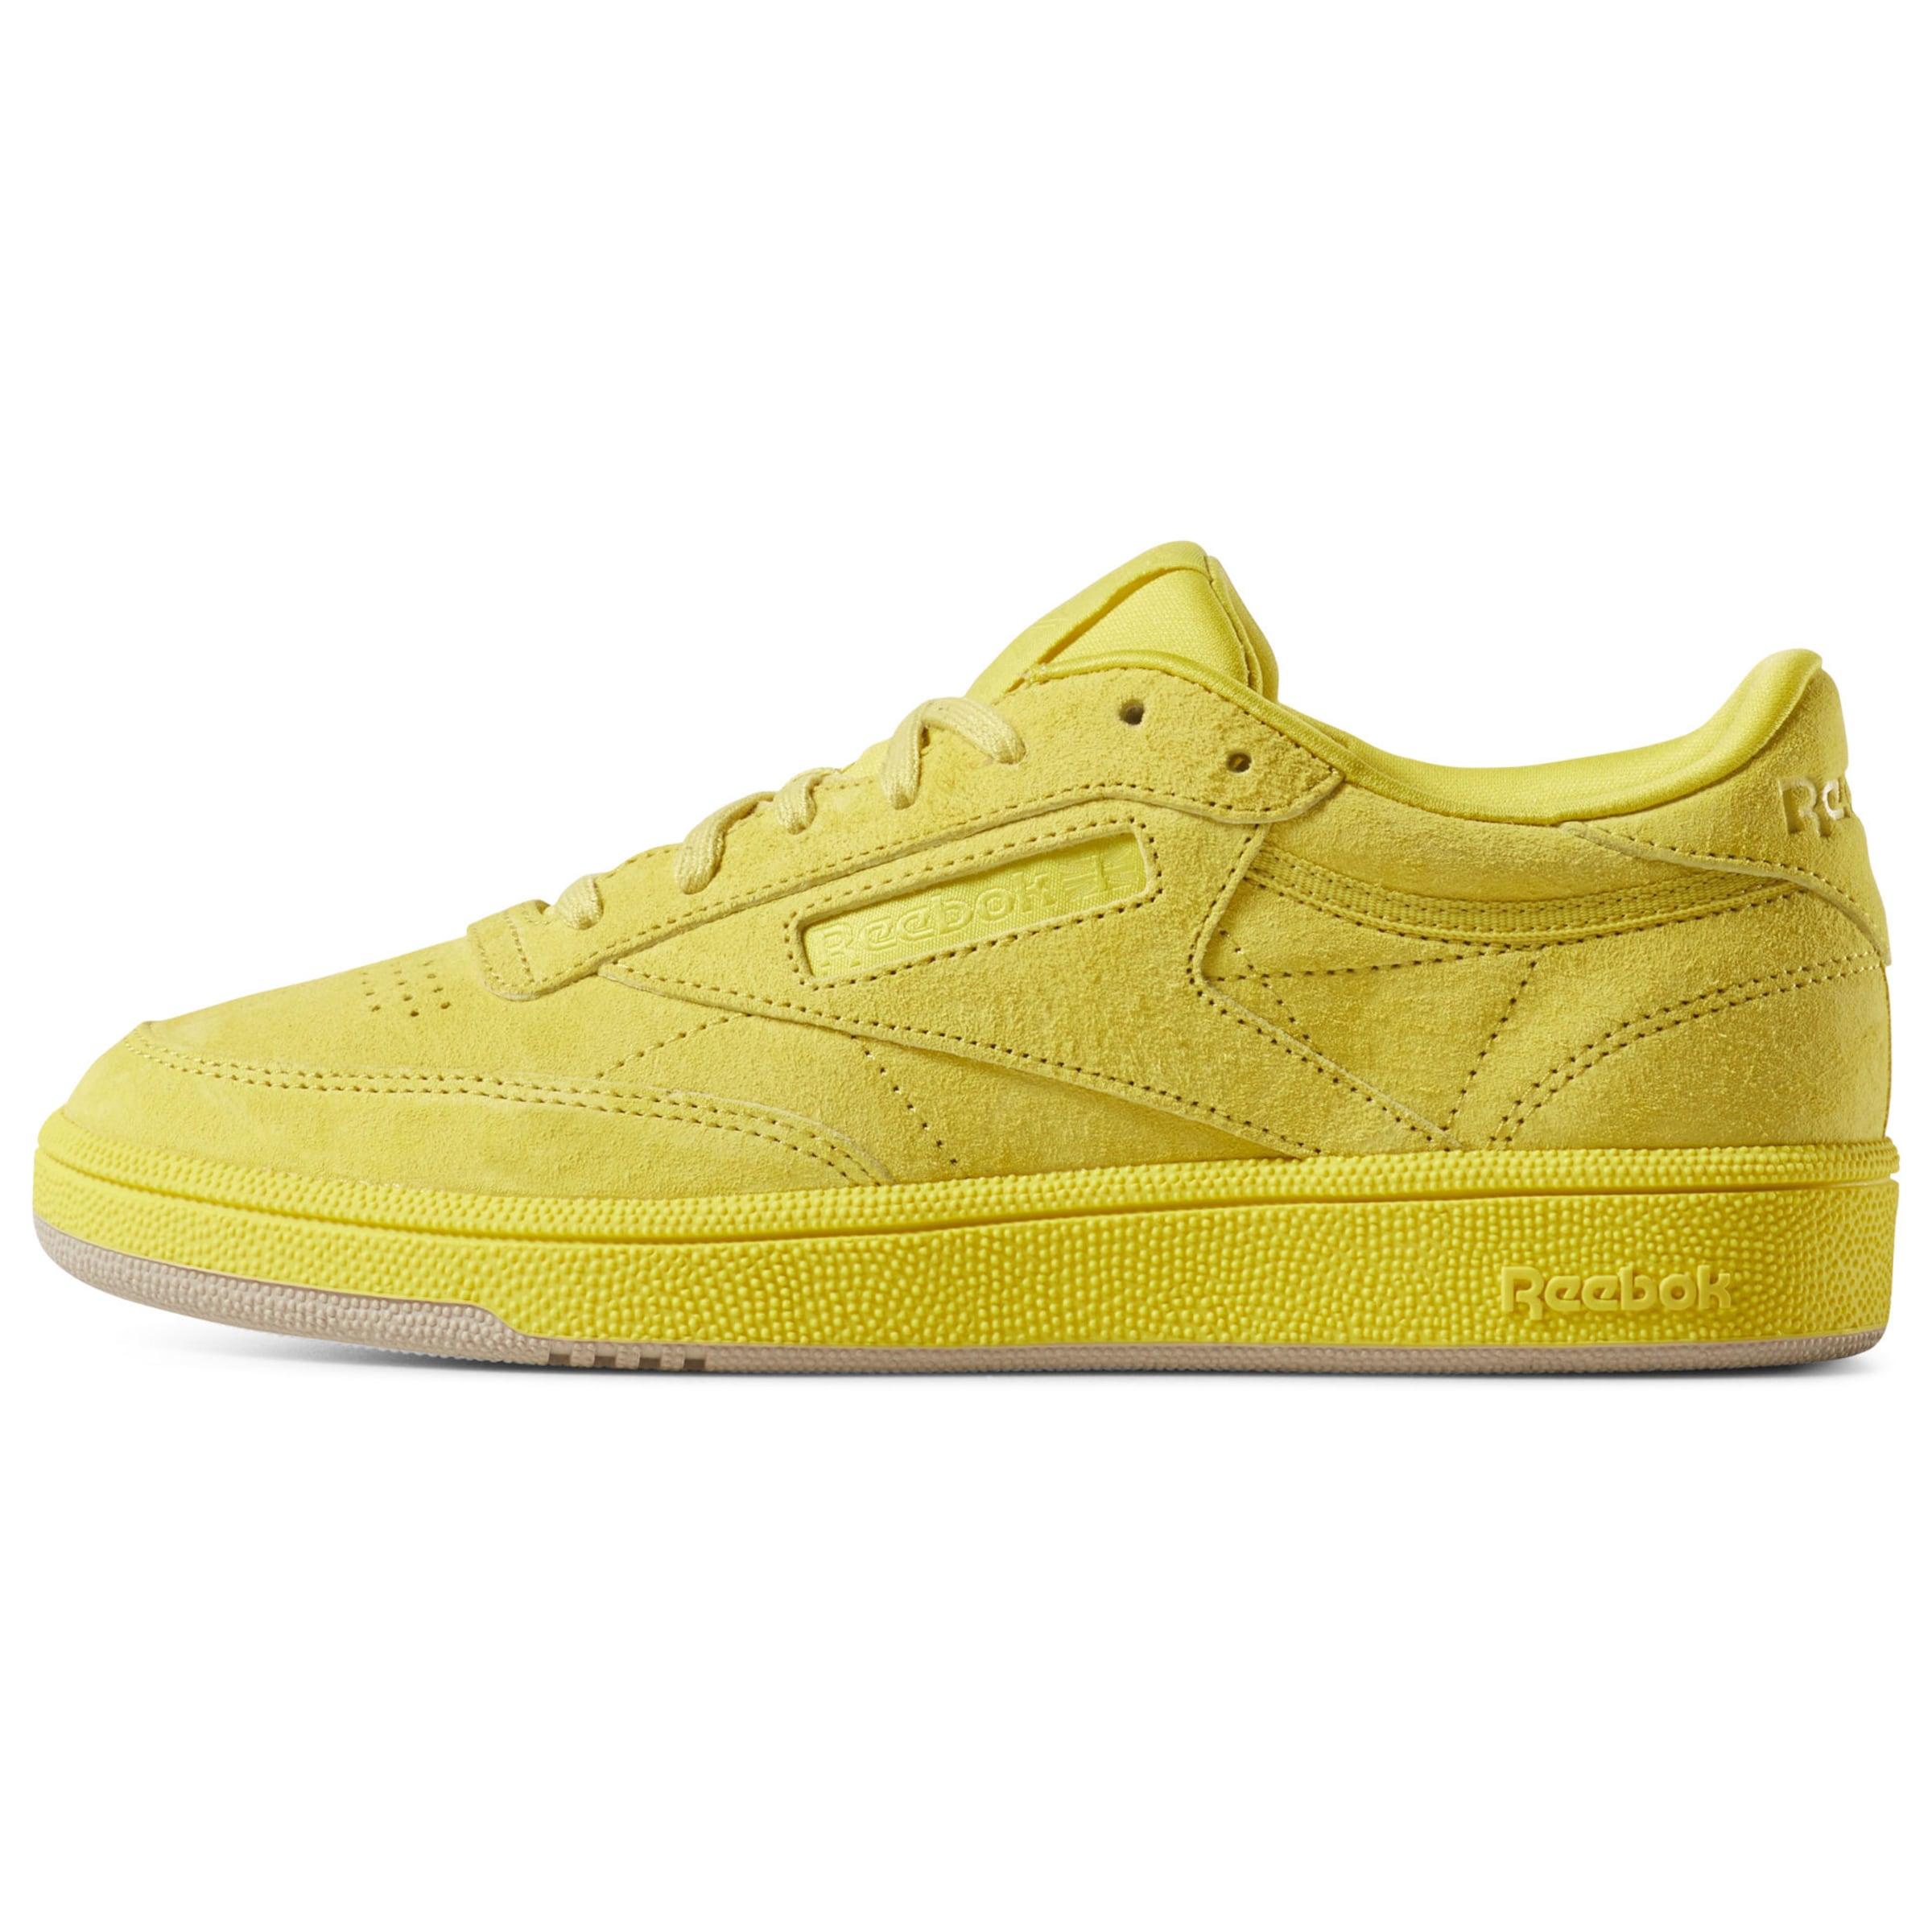 Classic Classic Gelb Classic Reebok In Reebok In Reebok Sneaker Sneaker Sneaker Gelb 0w8kXnNOP